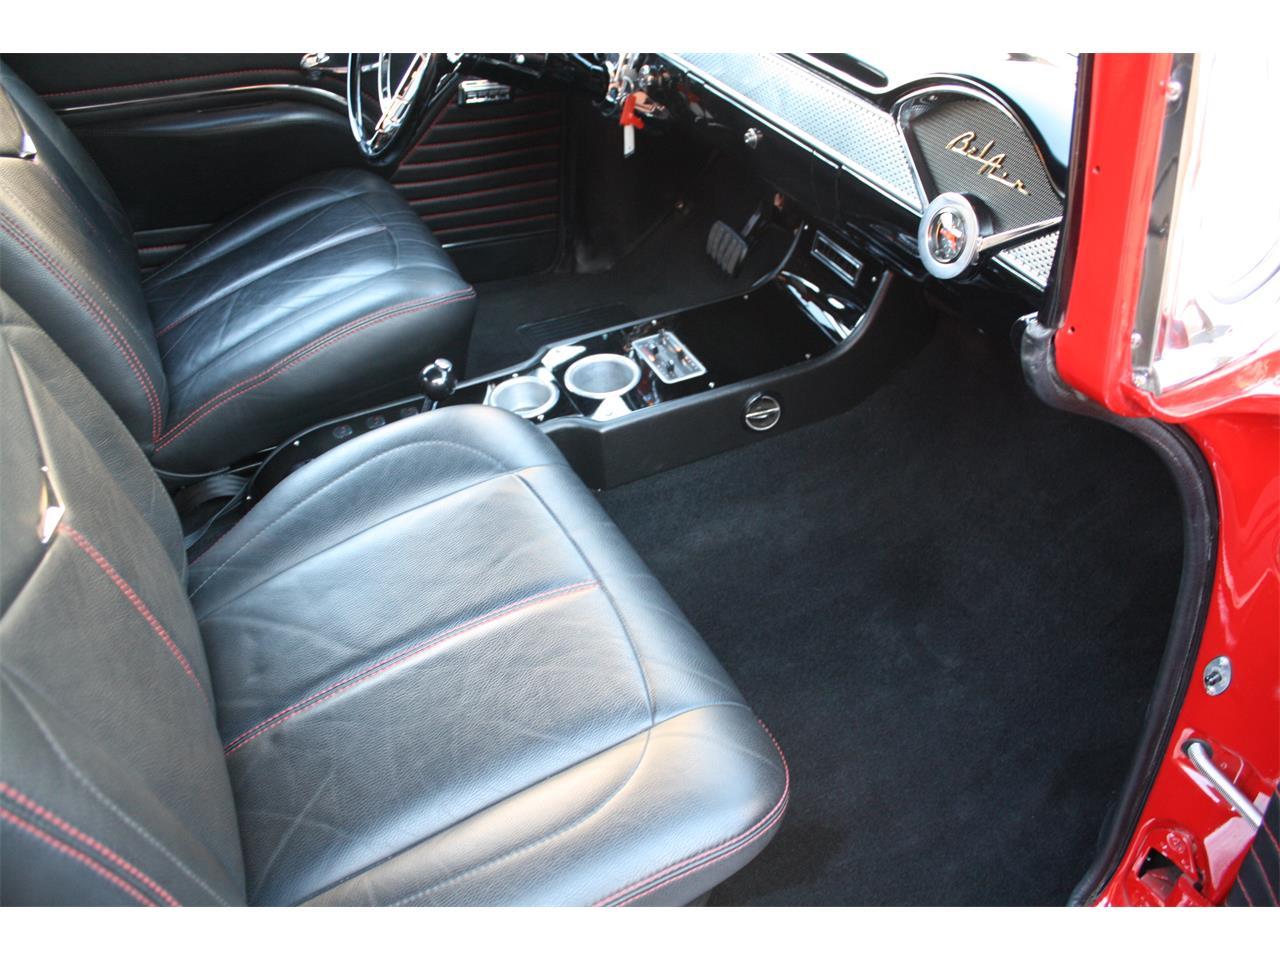 1955 Chevrolet Bel Air (CC-1352399) for sale in Tucson, Arizona